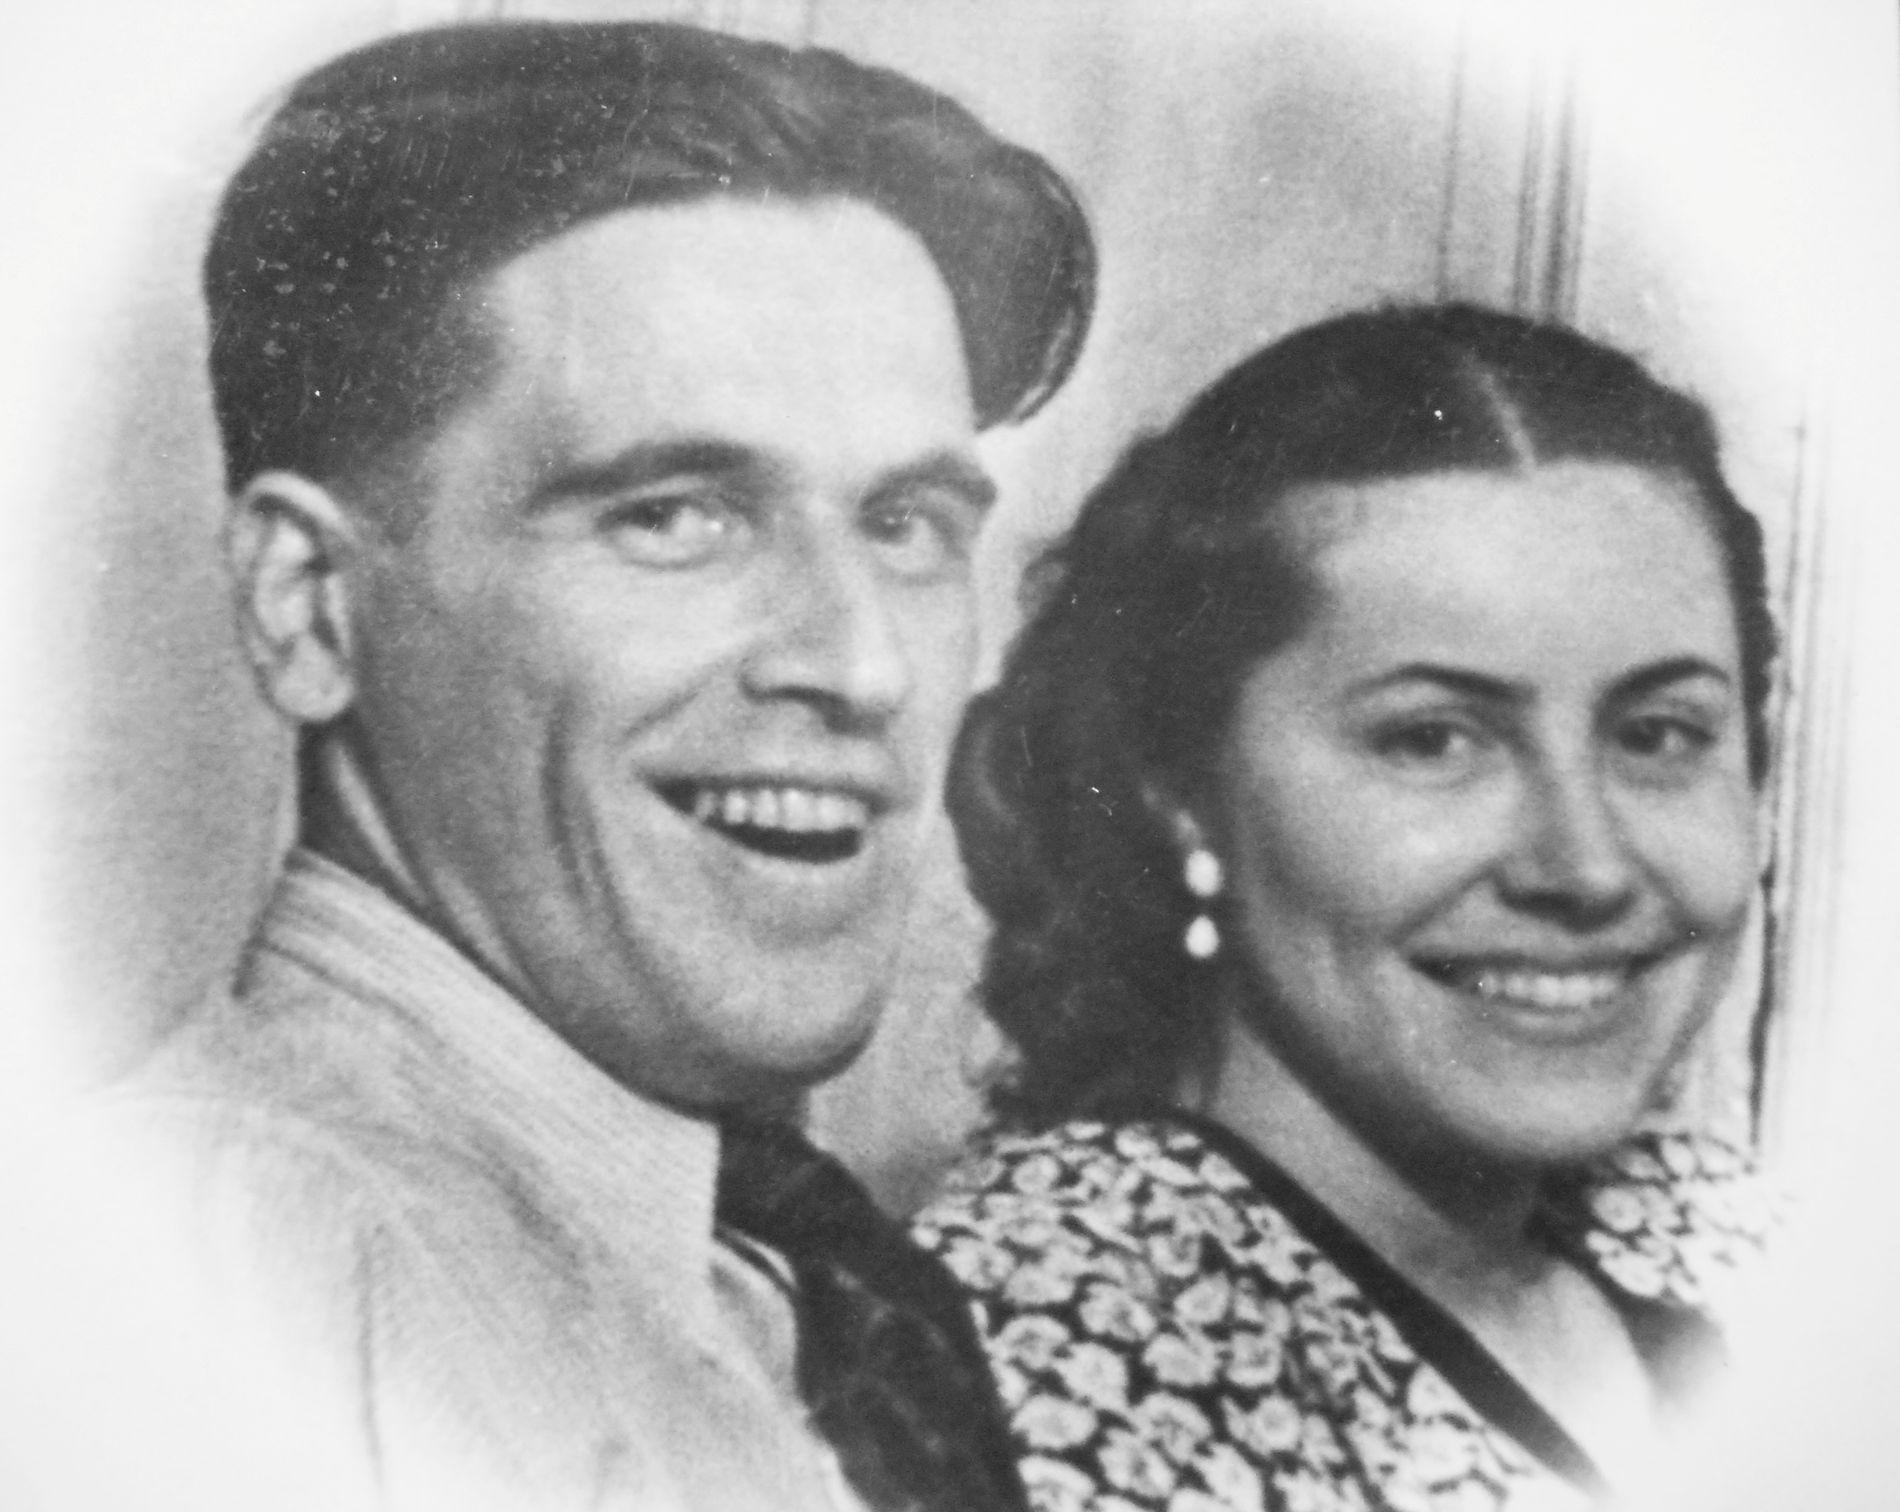 Marinas foreldre Jurij Vladimirovitsj Ekarev og Maria Vasilijeva Ekareva.